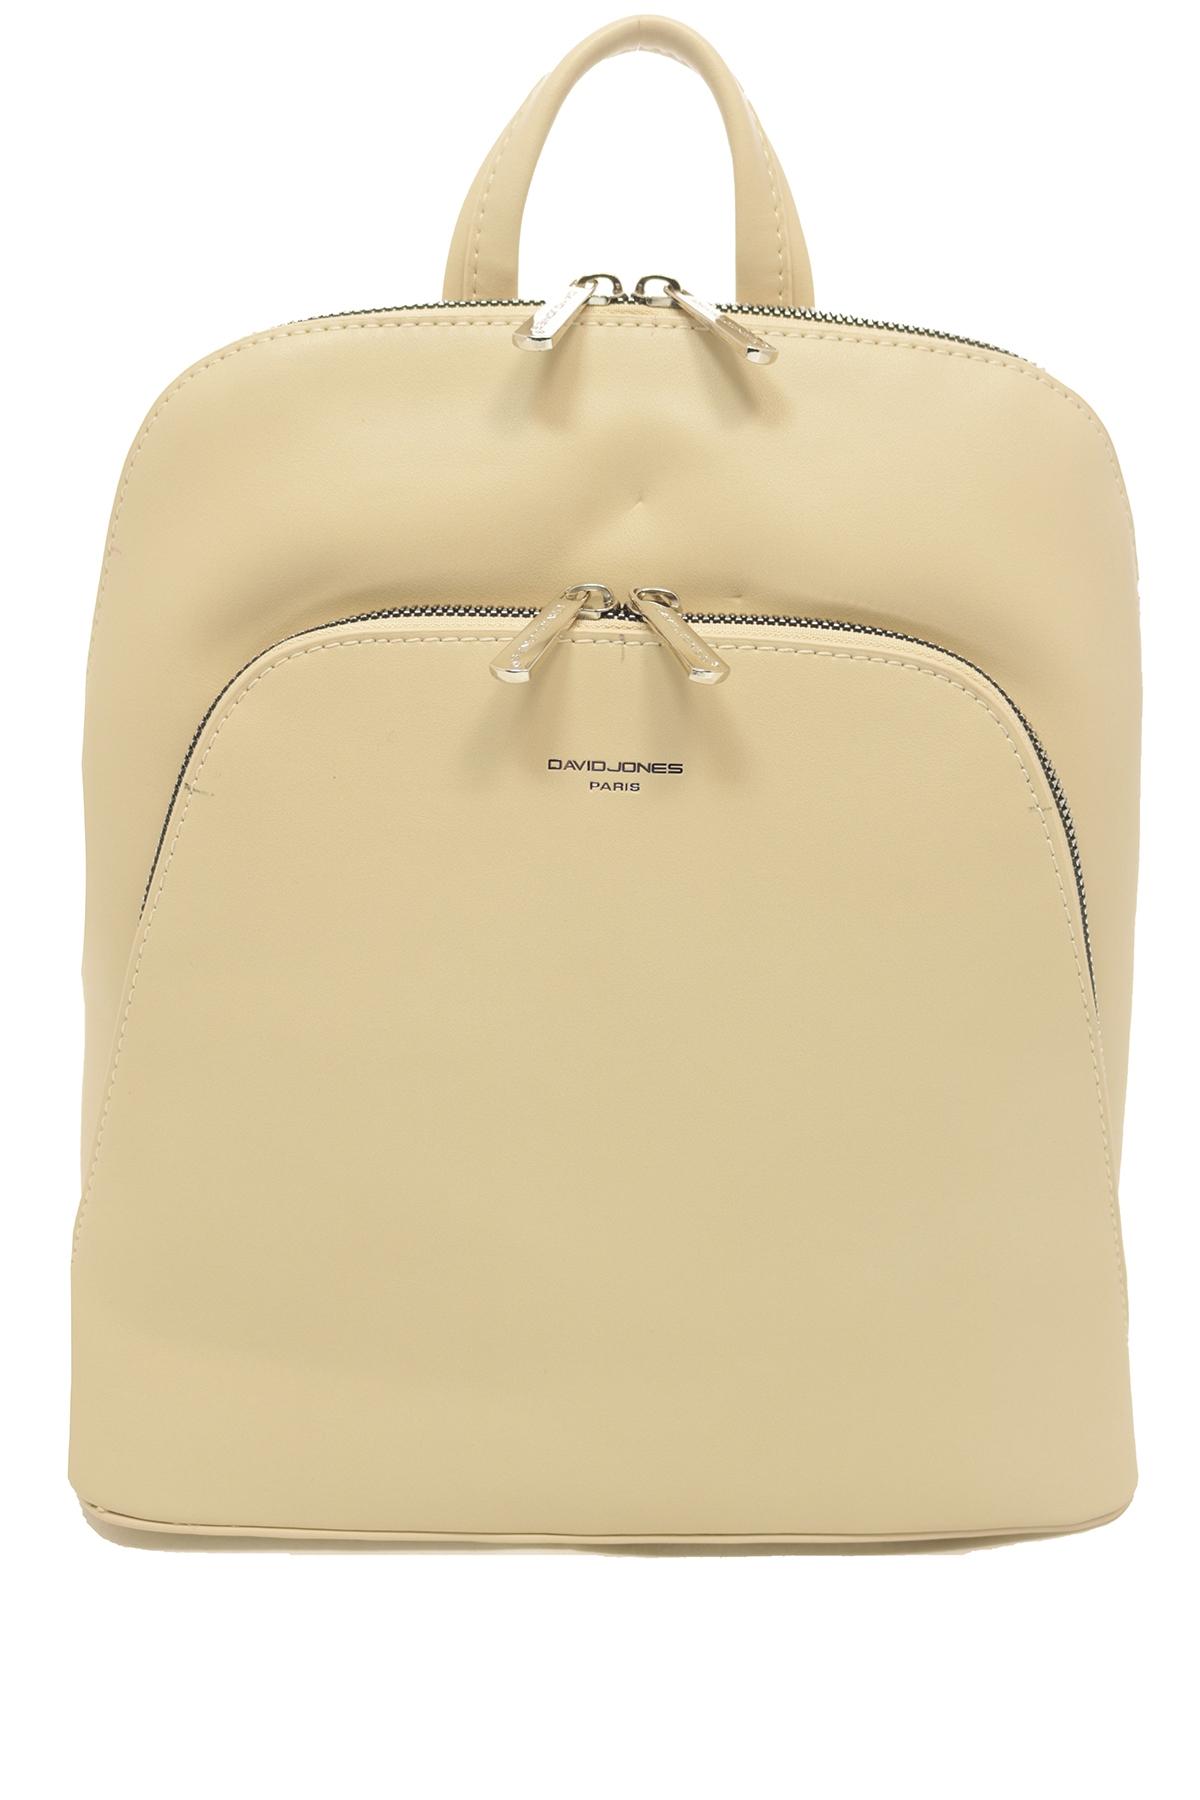 Рюкзак David Jones 6031 оптом